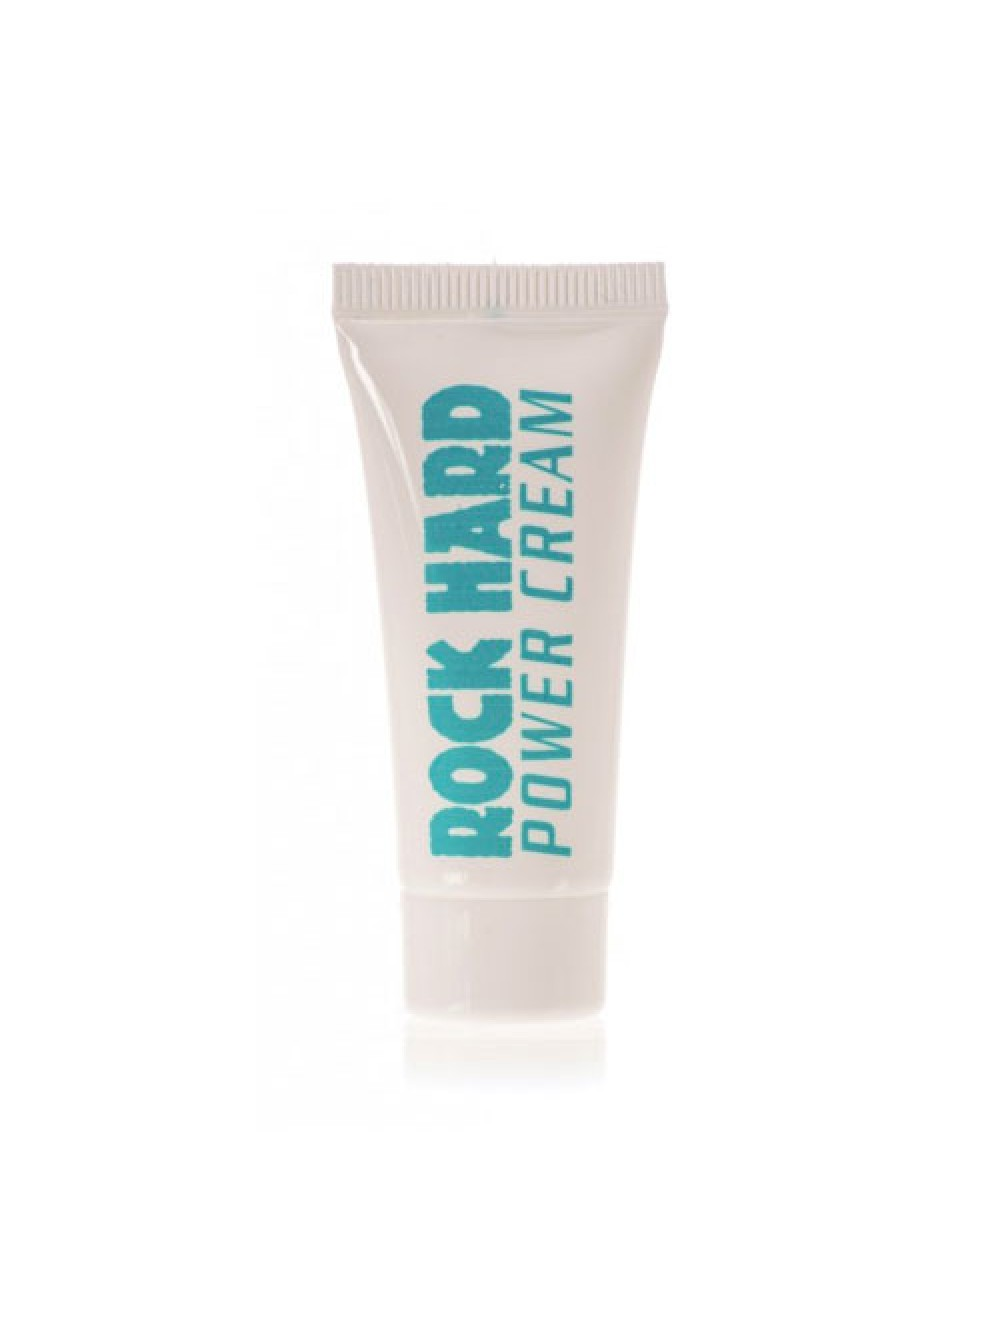 Rock Hard Power Cream 15ml